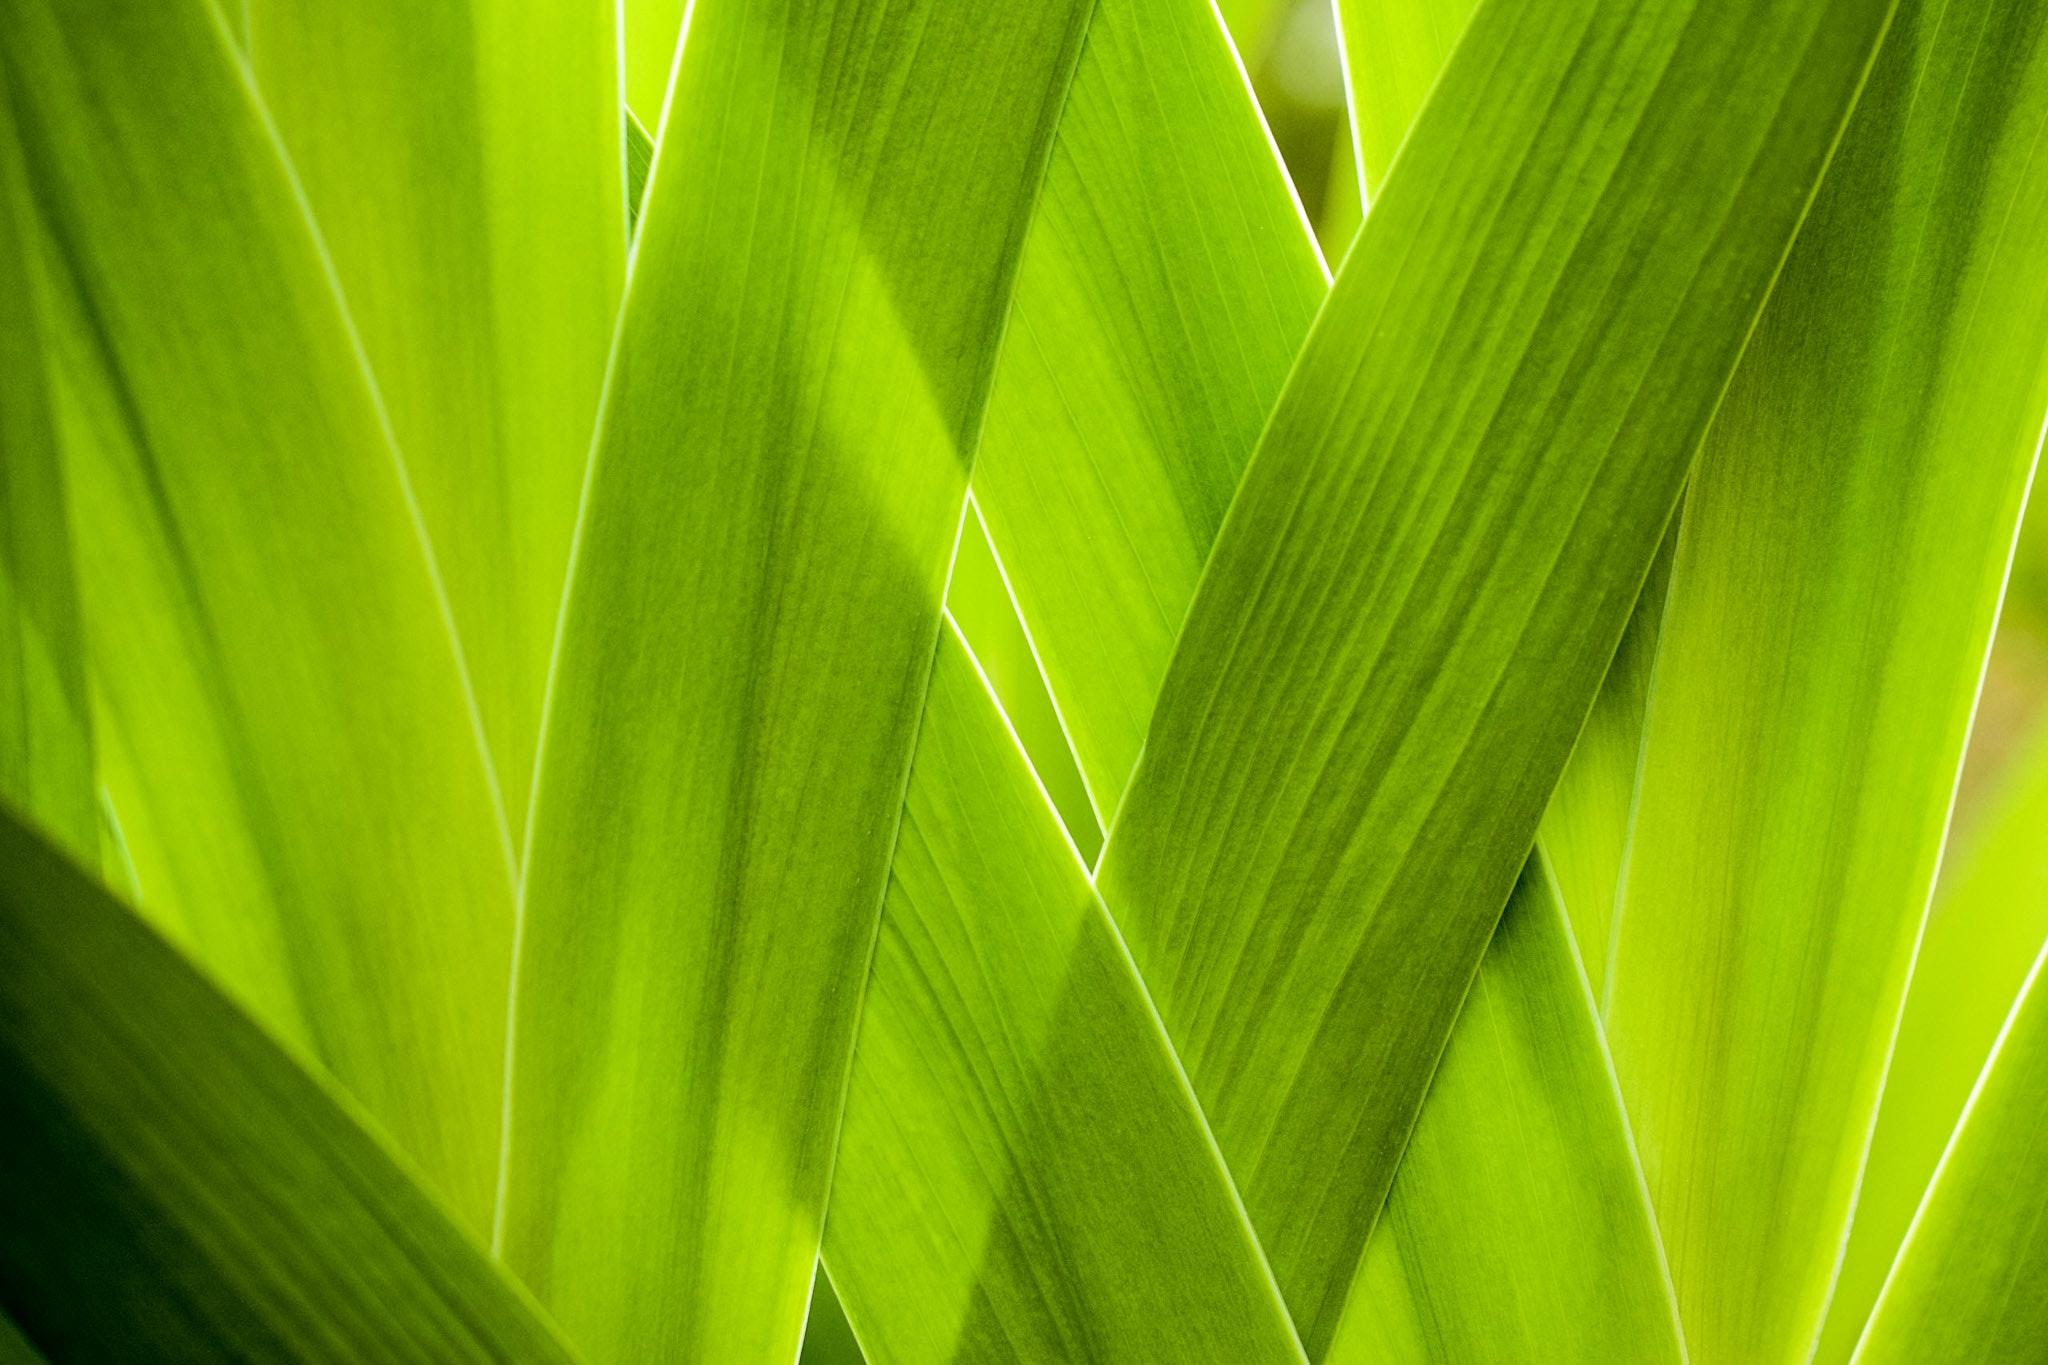 green banana leaf with substance of clear liquid  u00b7 free